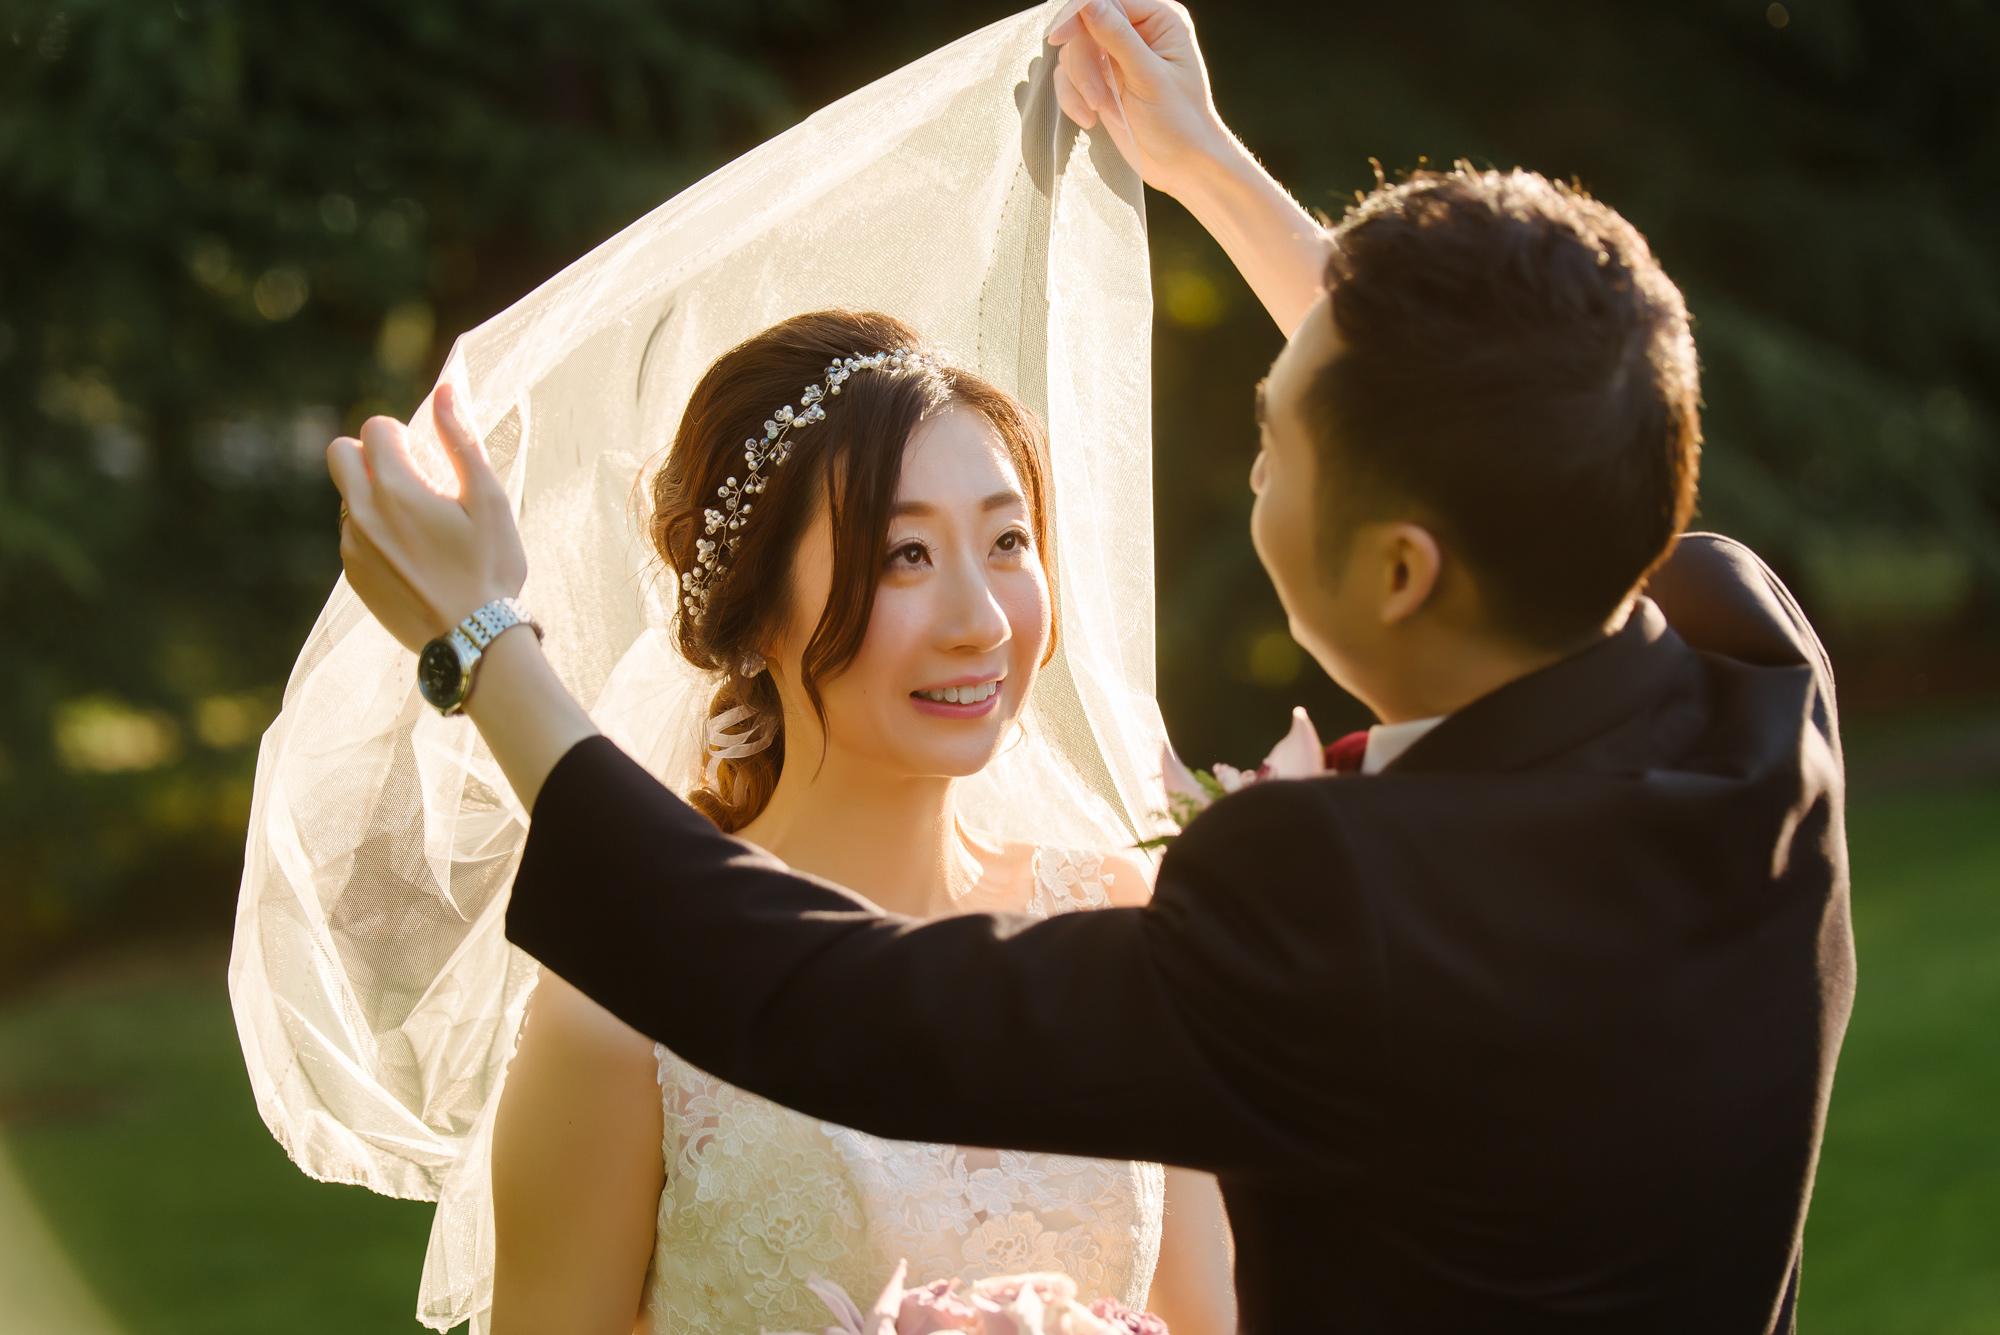 minoru_chapel_richmond_wedding_ceremony 16402315.jpg